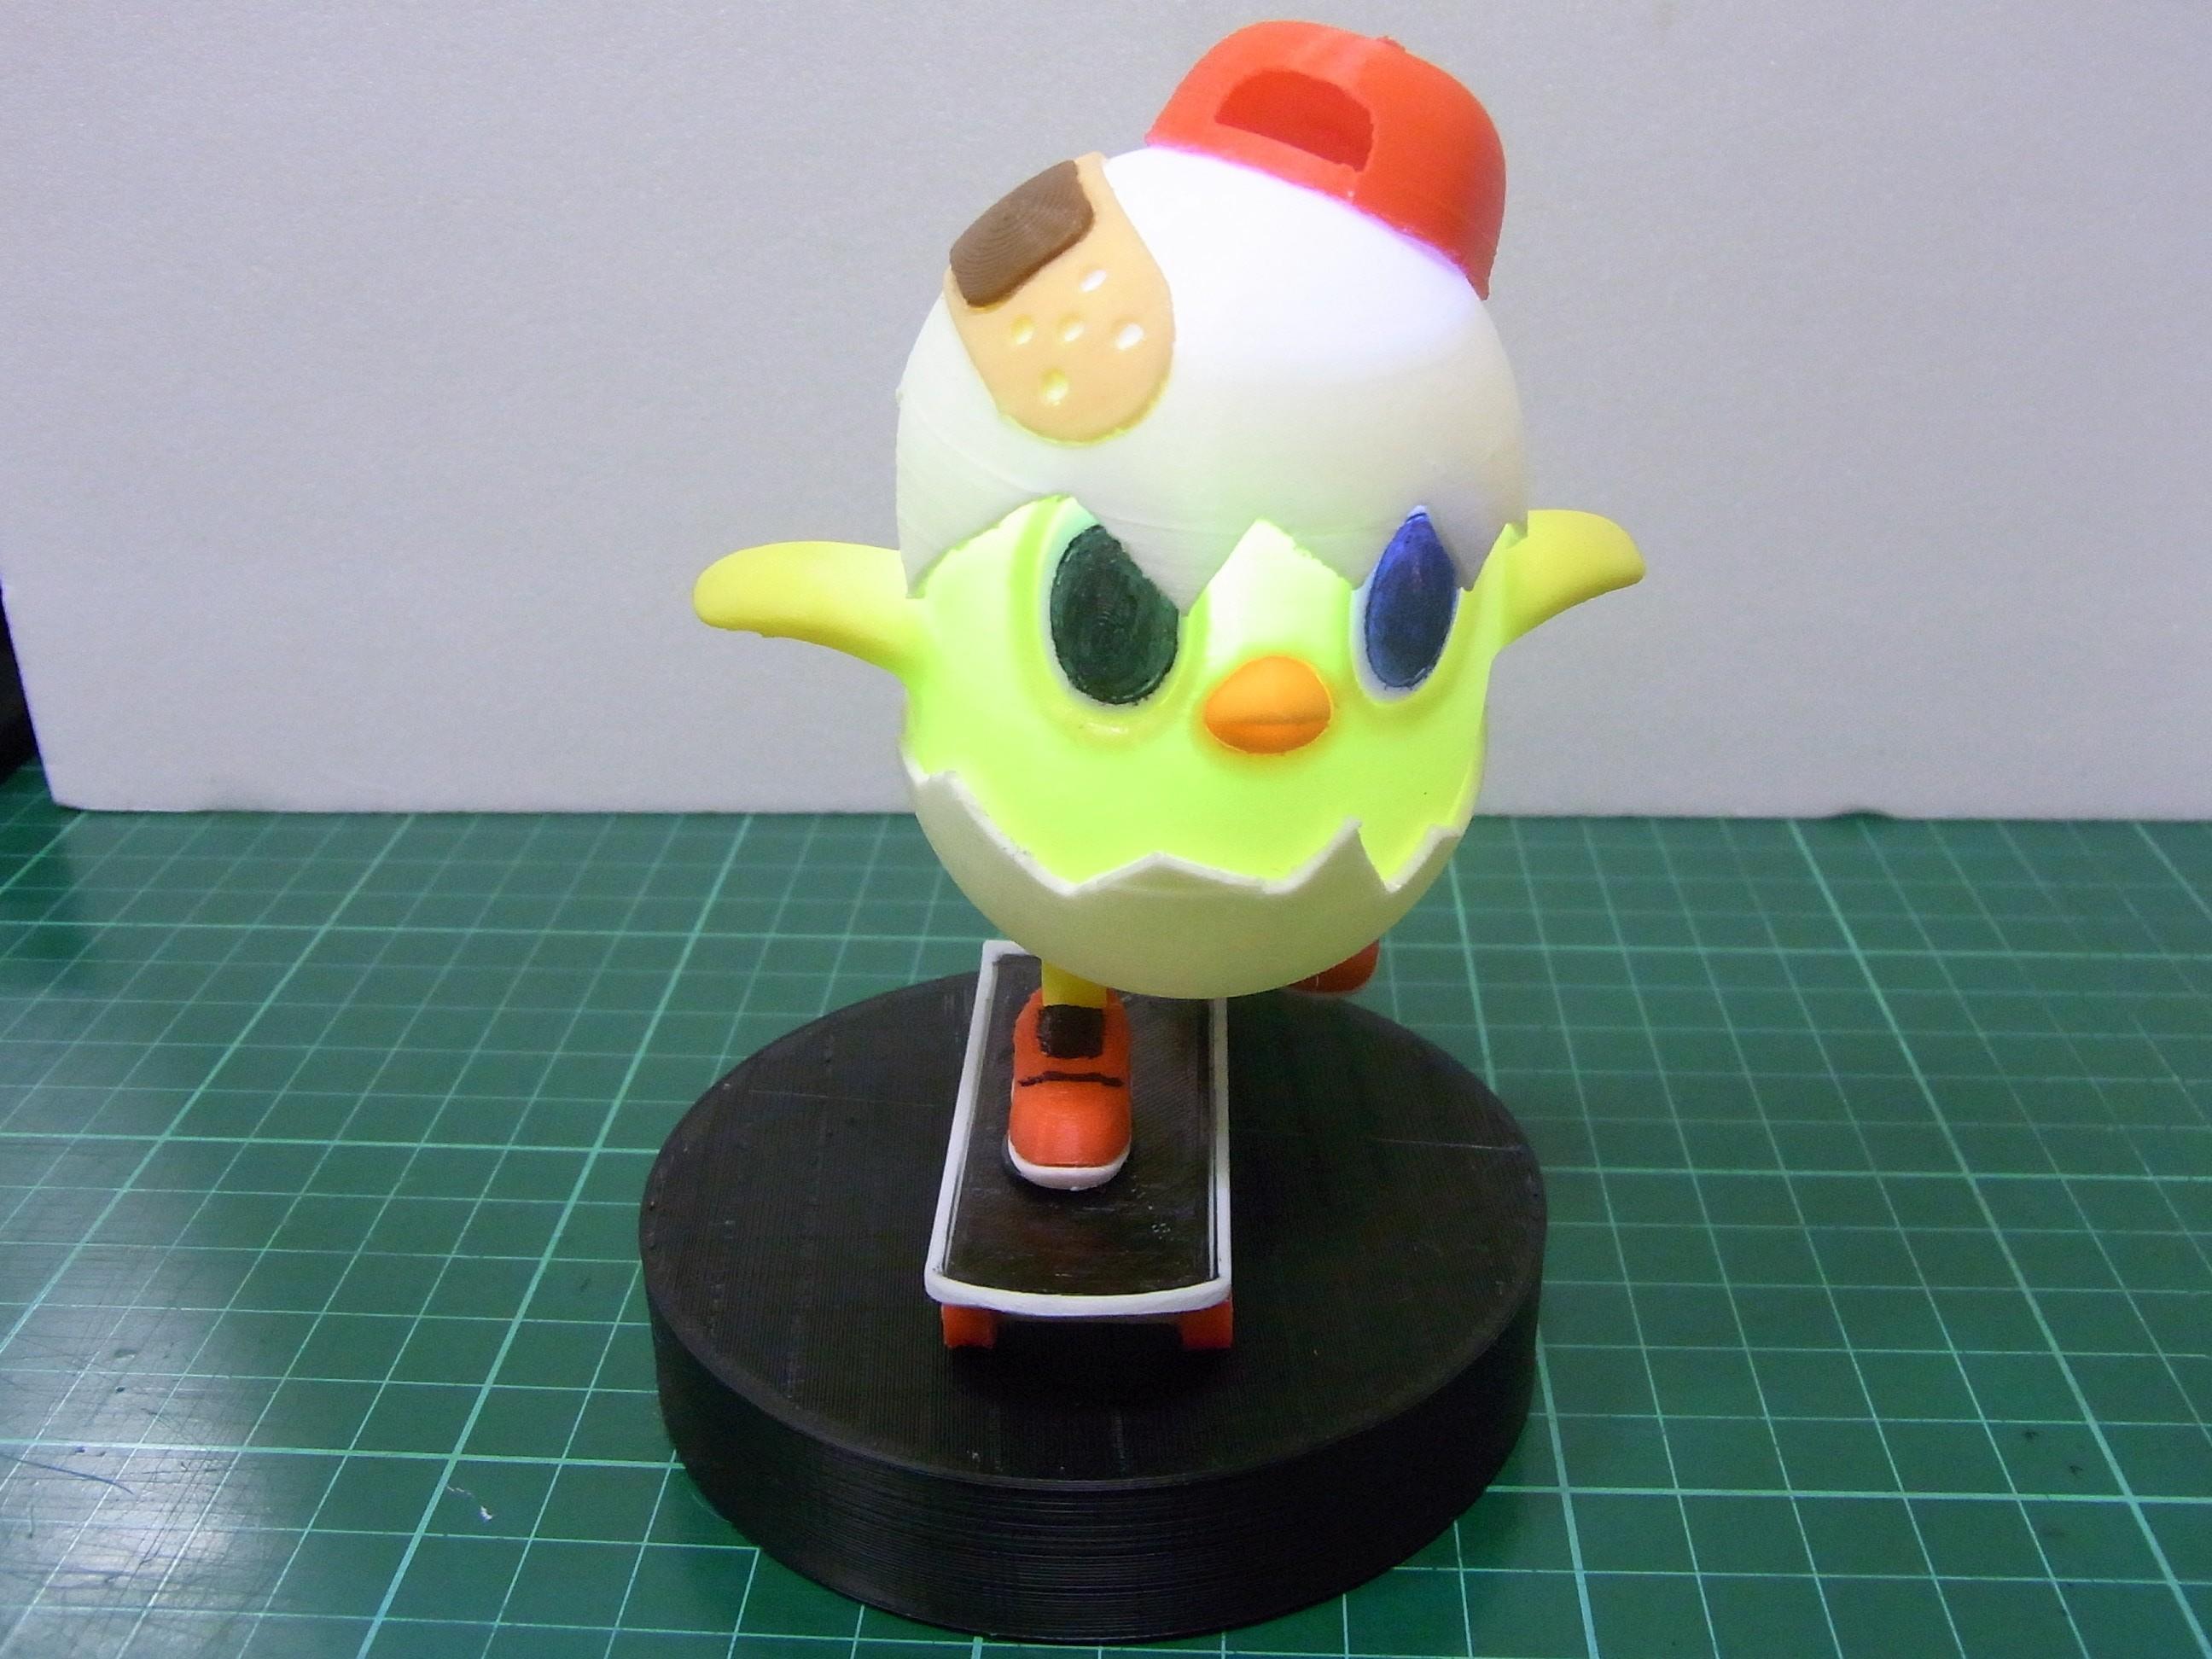 RIMG0285.JPG Download free STL file 2017 台北燈節 / Taipei Lantern Festival • 3D printer template, 86Duino